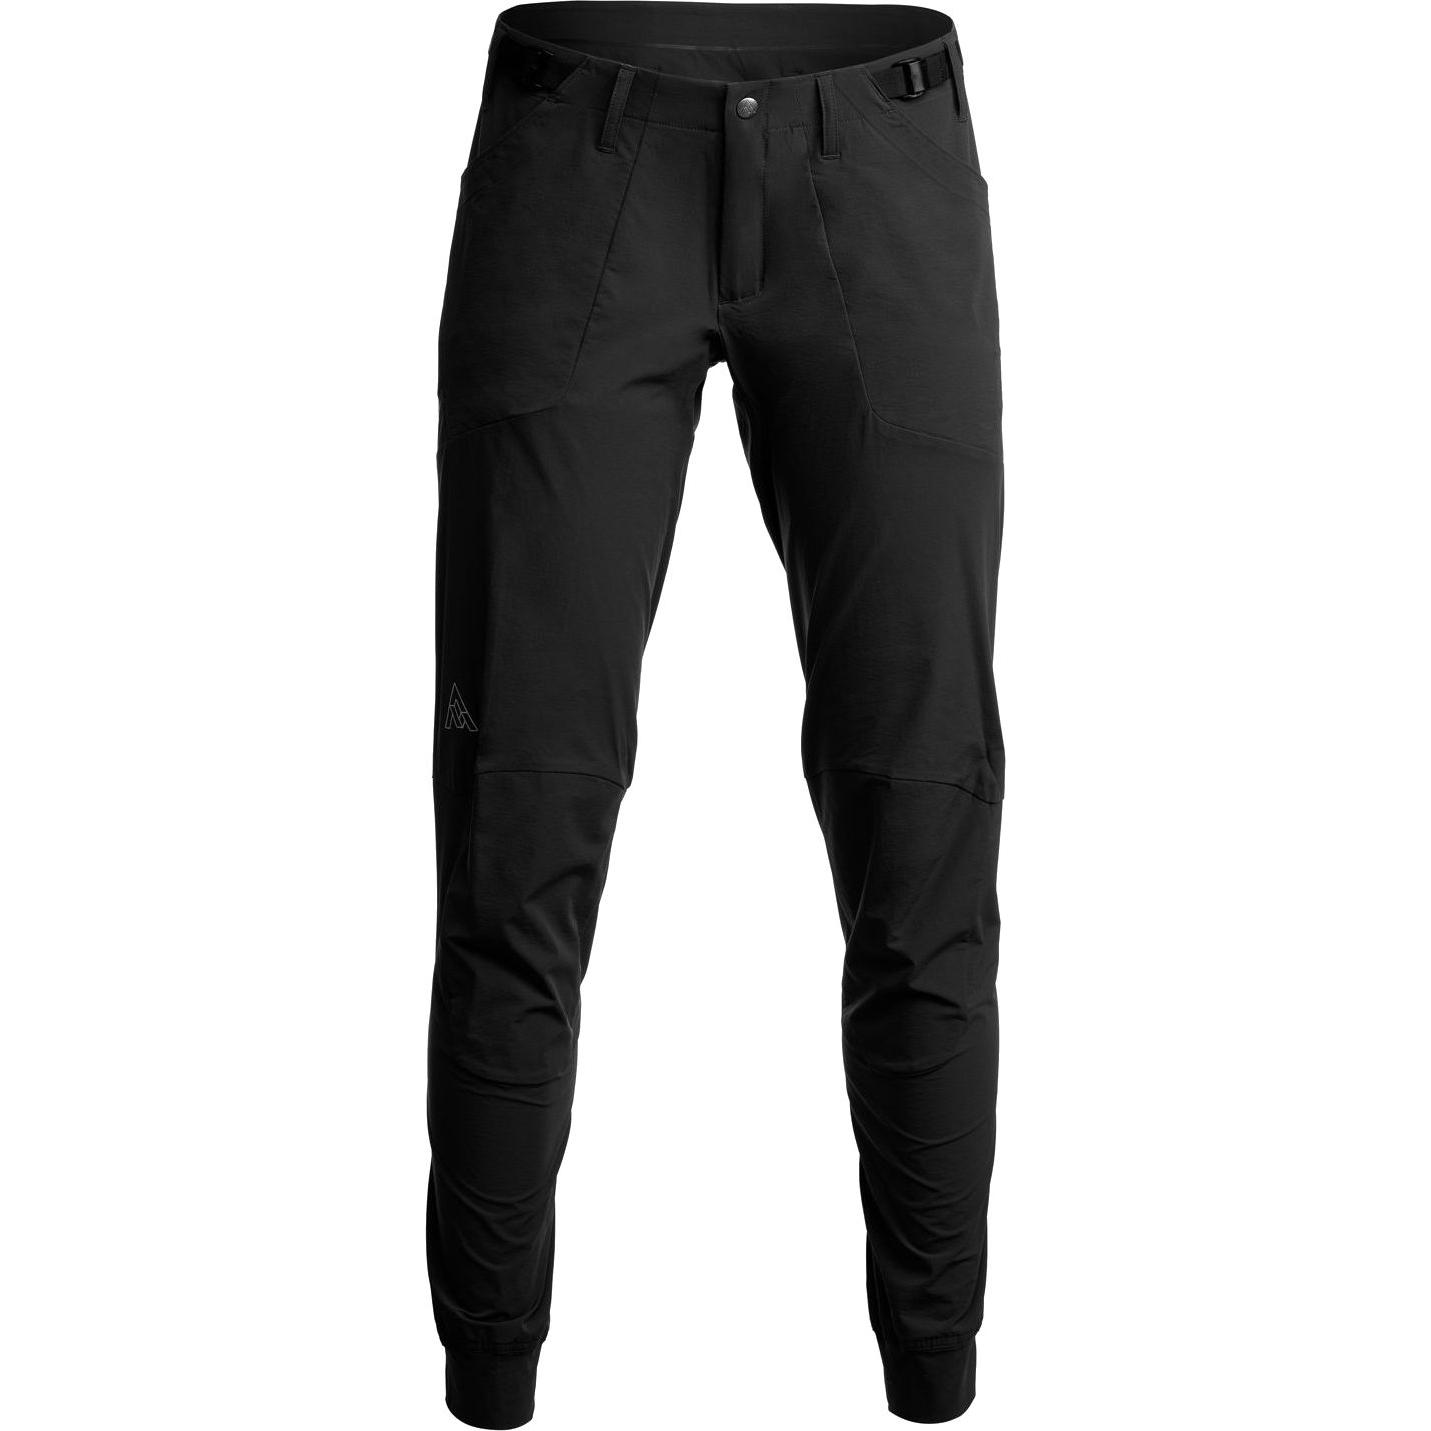 7mesh Glidepath Pantalones Mujer - negro